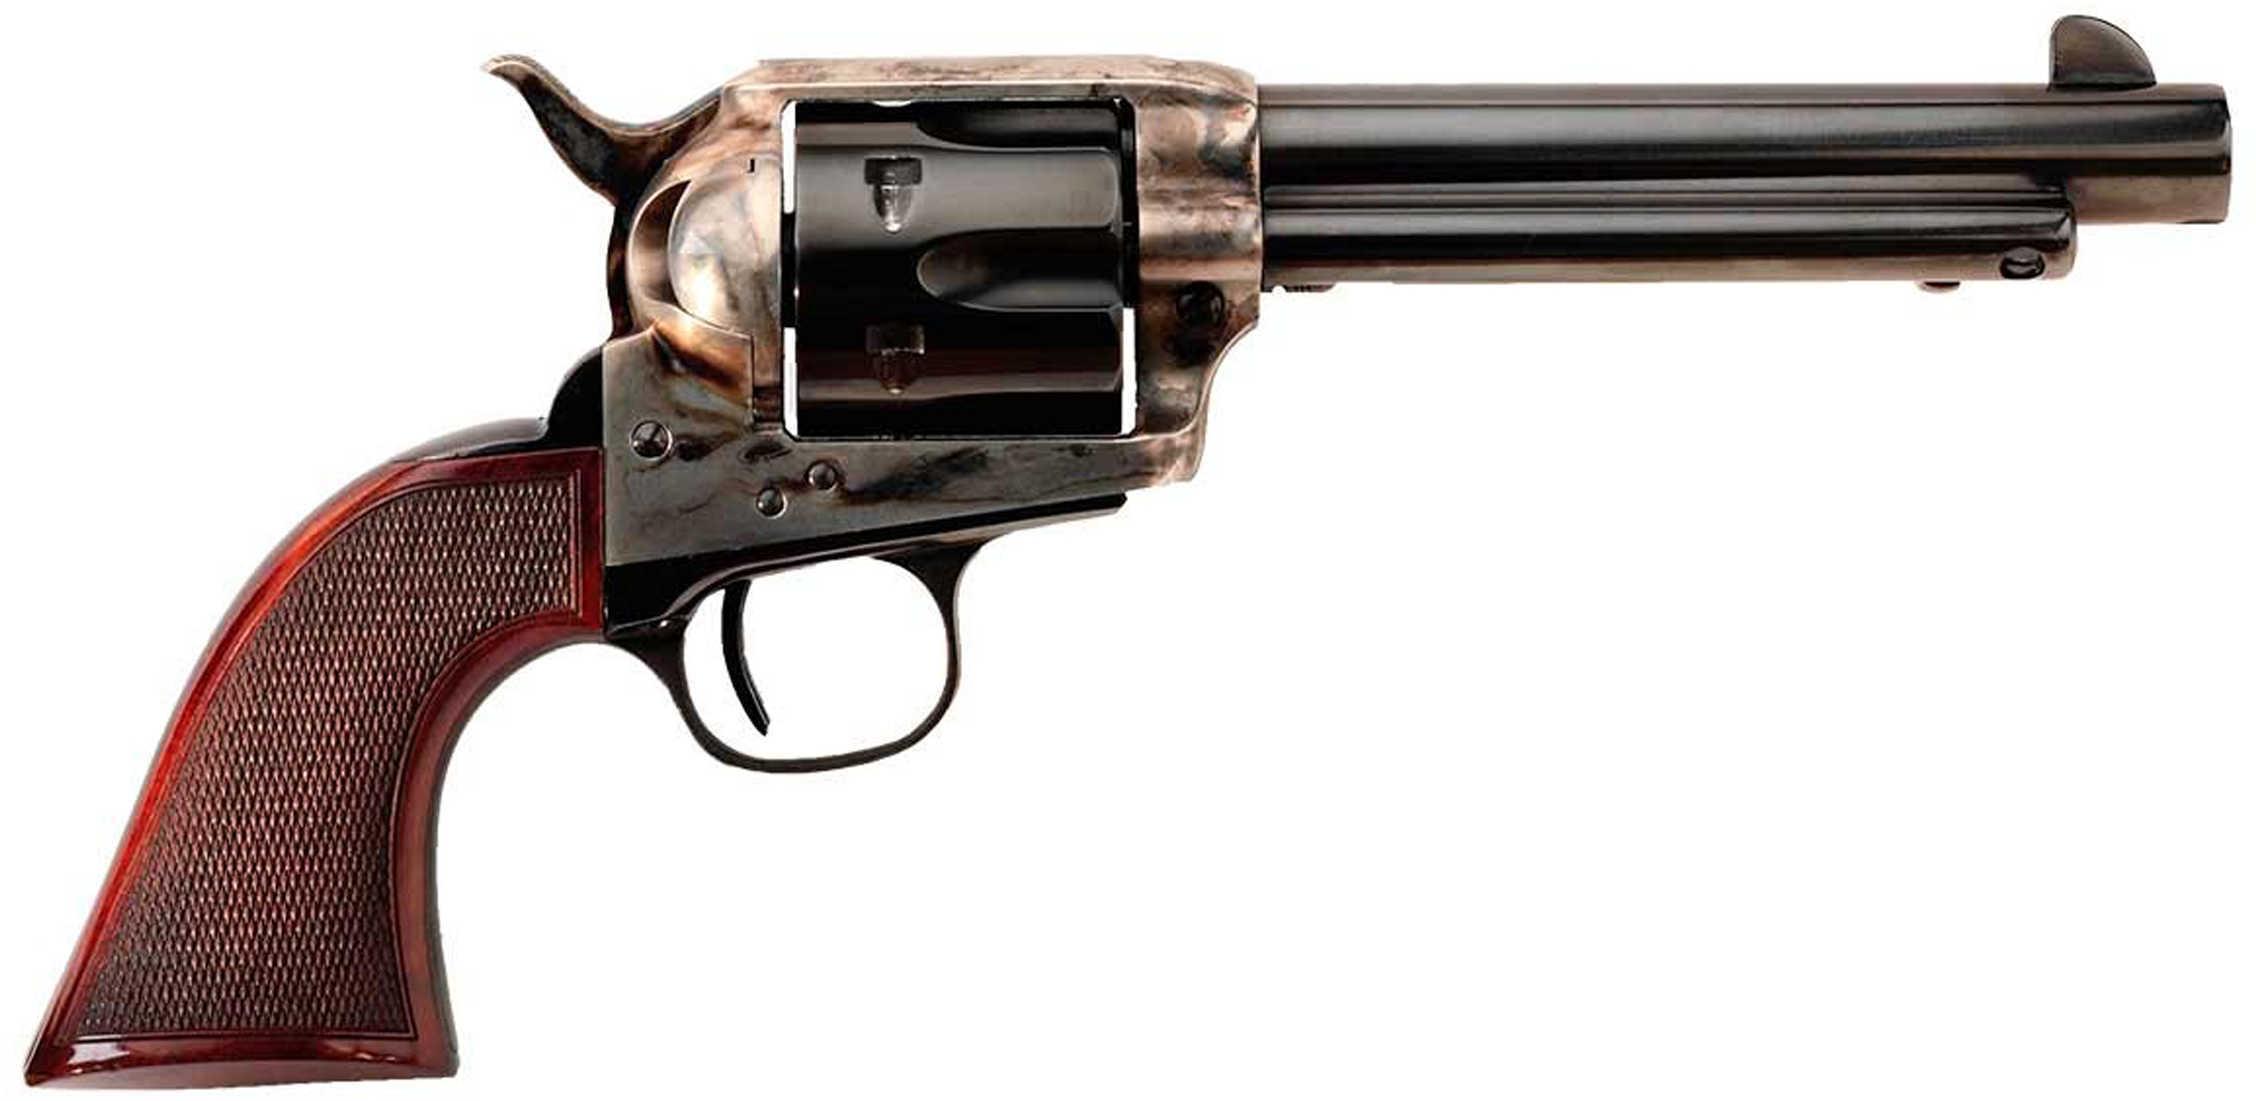 "Taylor's & Company Smoke Wagon 45 Colt 5.5"" Barrel Custom Action Work Revolver 4110DE"